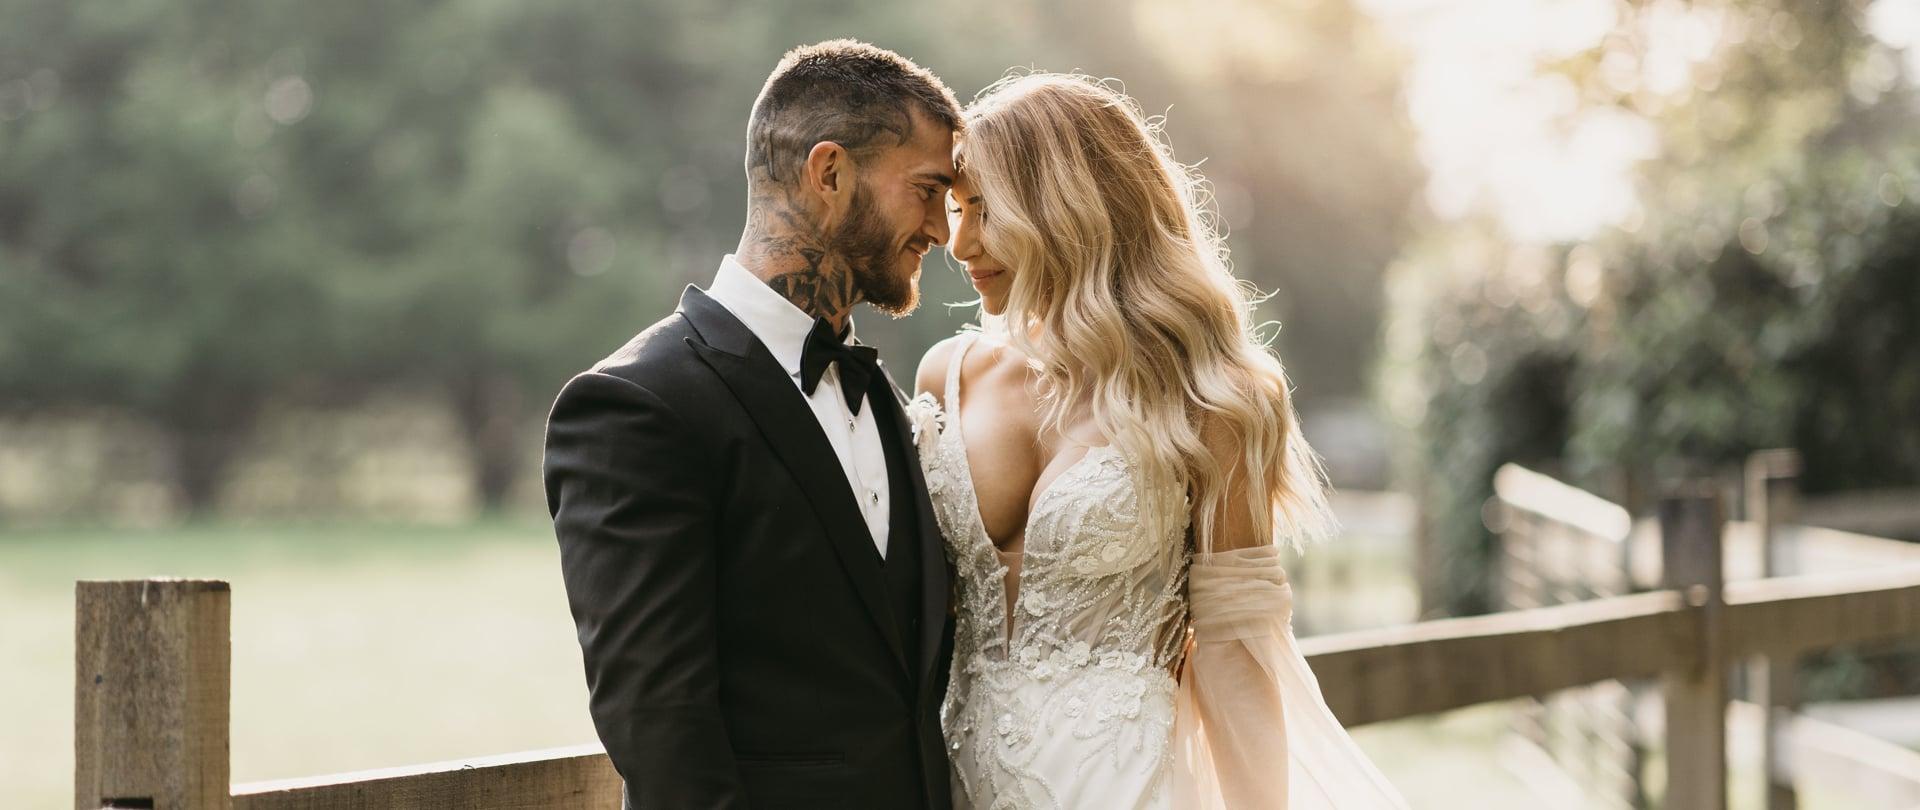 Sharah & Matt Wedding Video Filmed at Berry, New South Wales